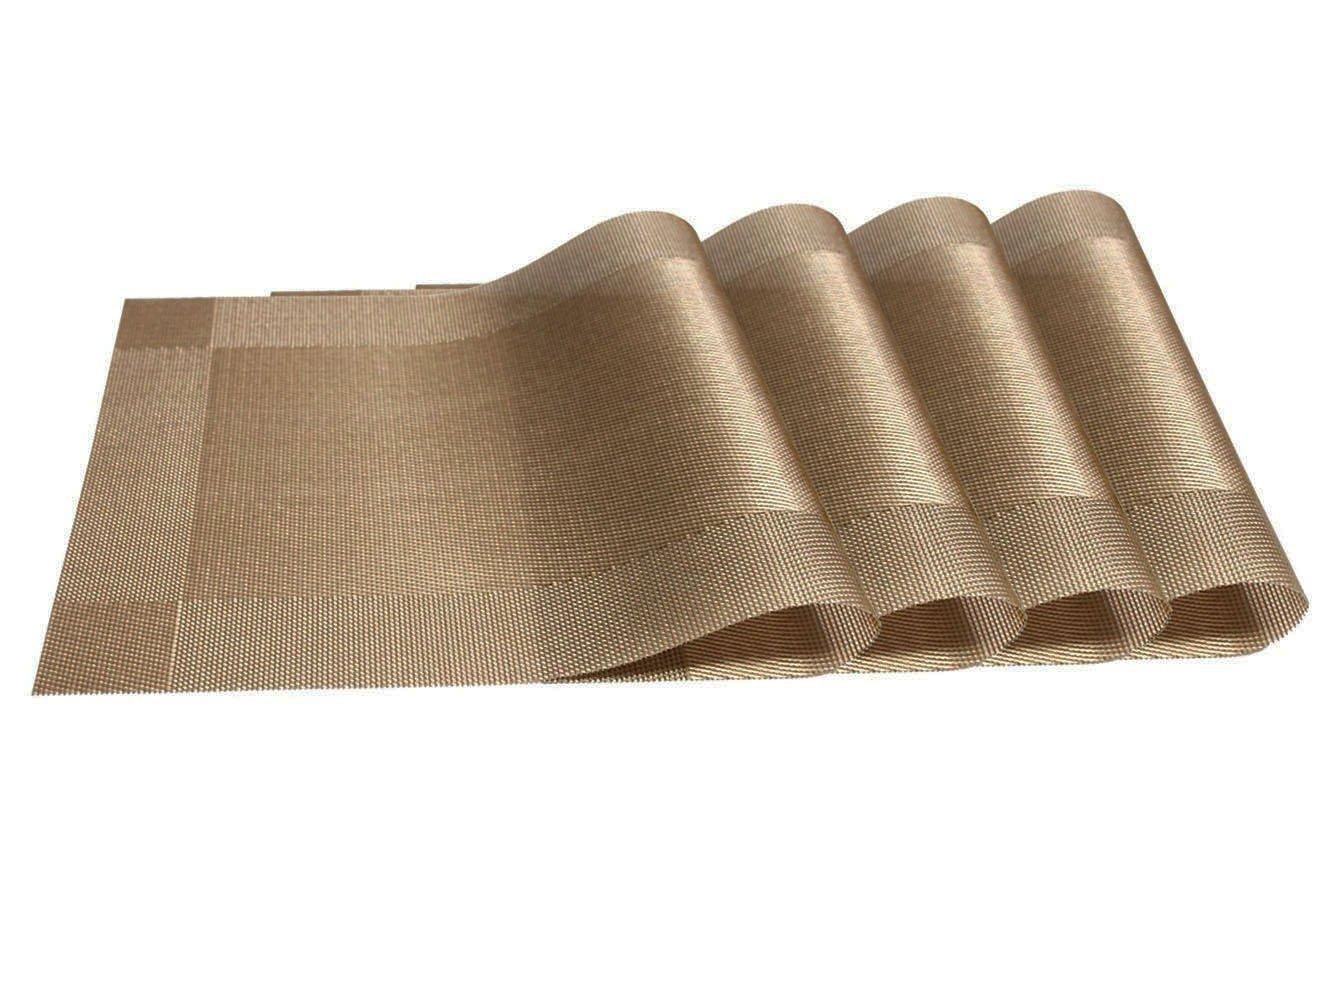 October Elf Table Mat Vintage PVC Washable Non-slip Insulation Placemat Mats Set of 4 Cream